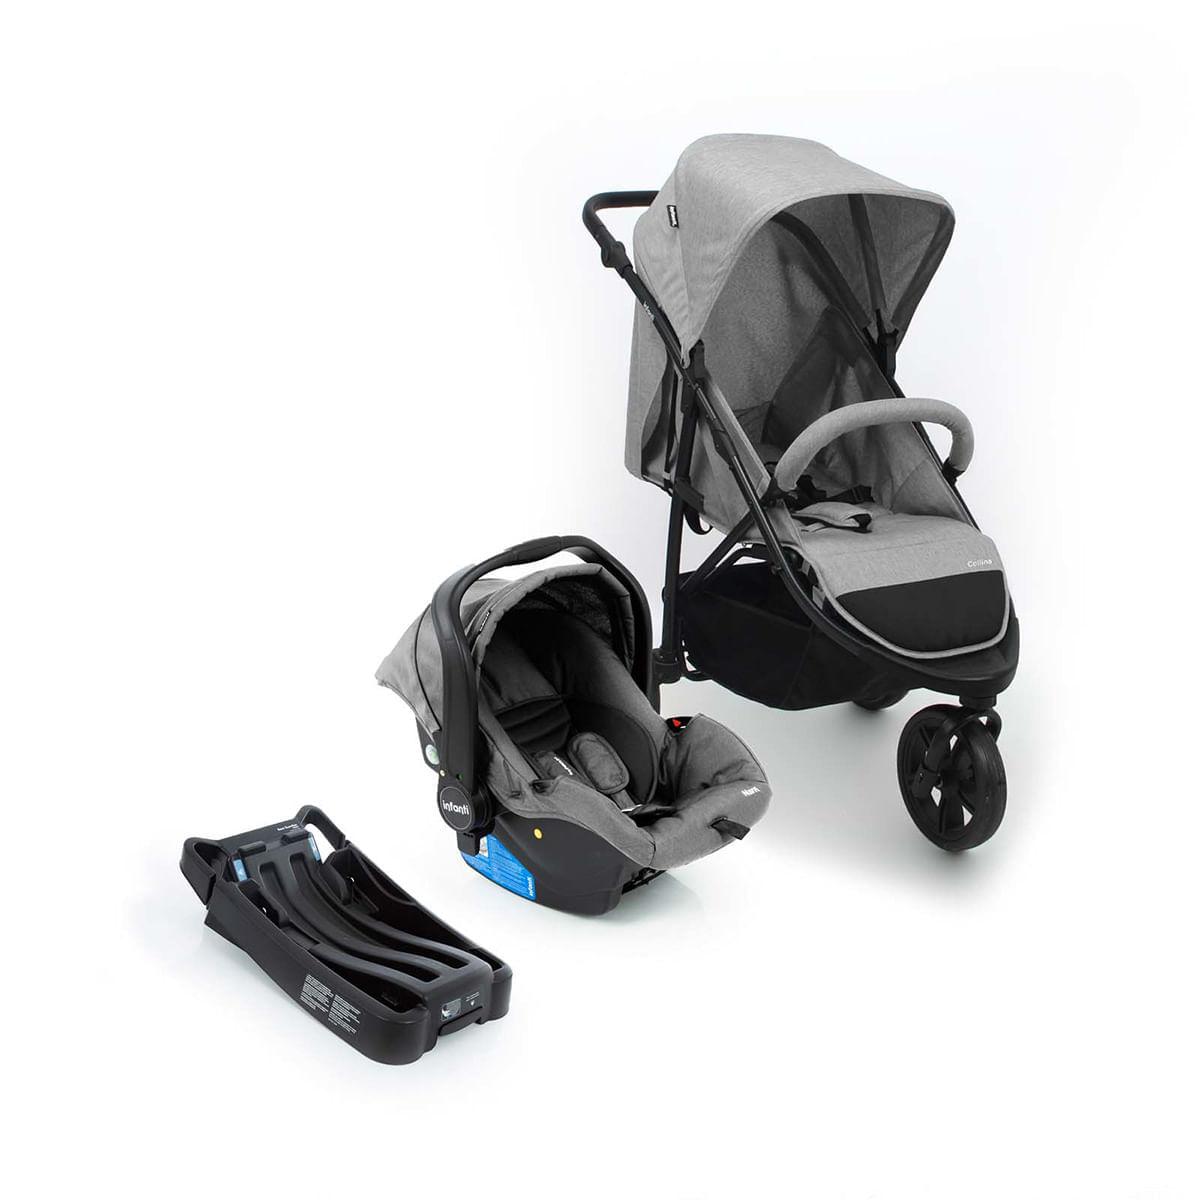 Carrinho Bebê Conforto Collina Travel System Cinza Infanti